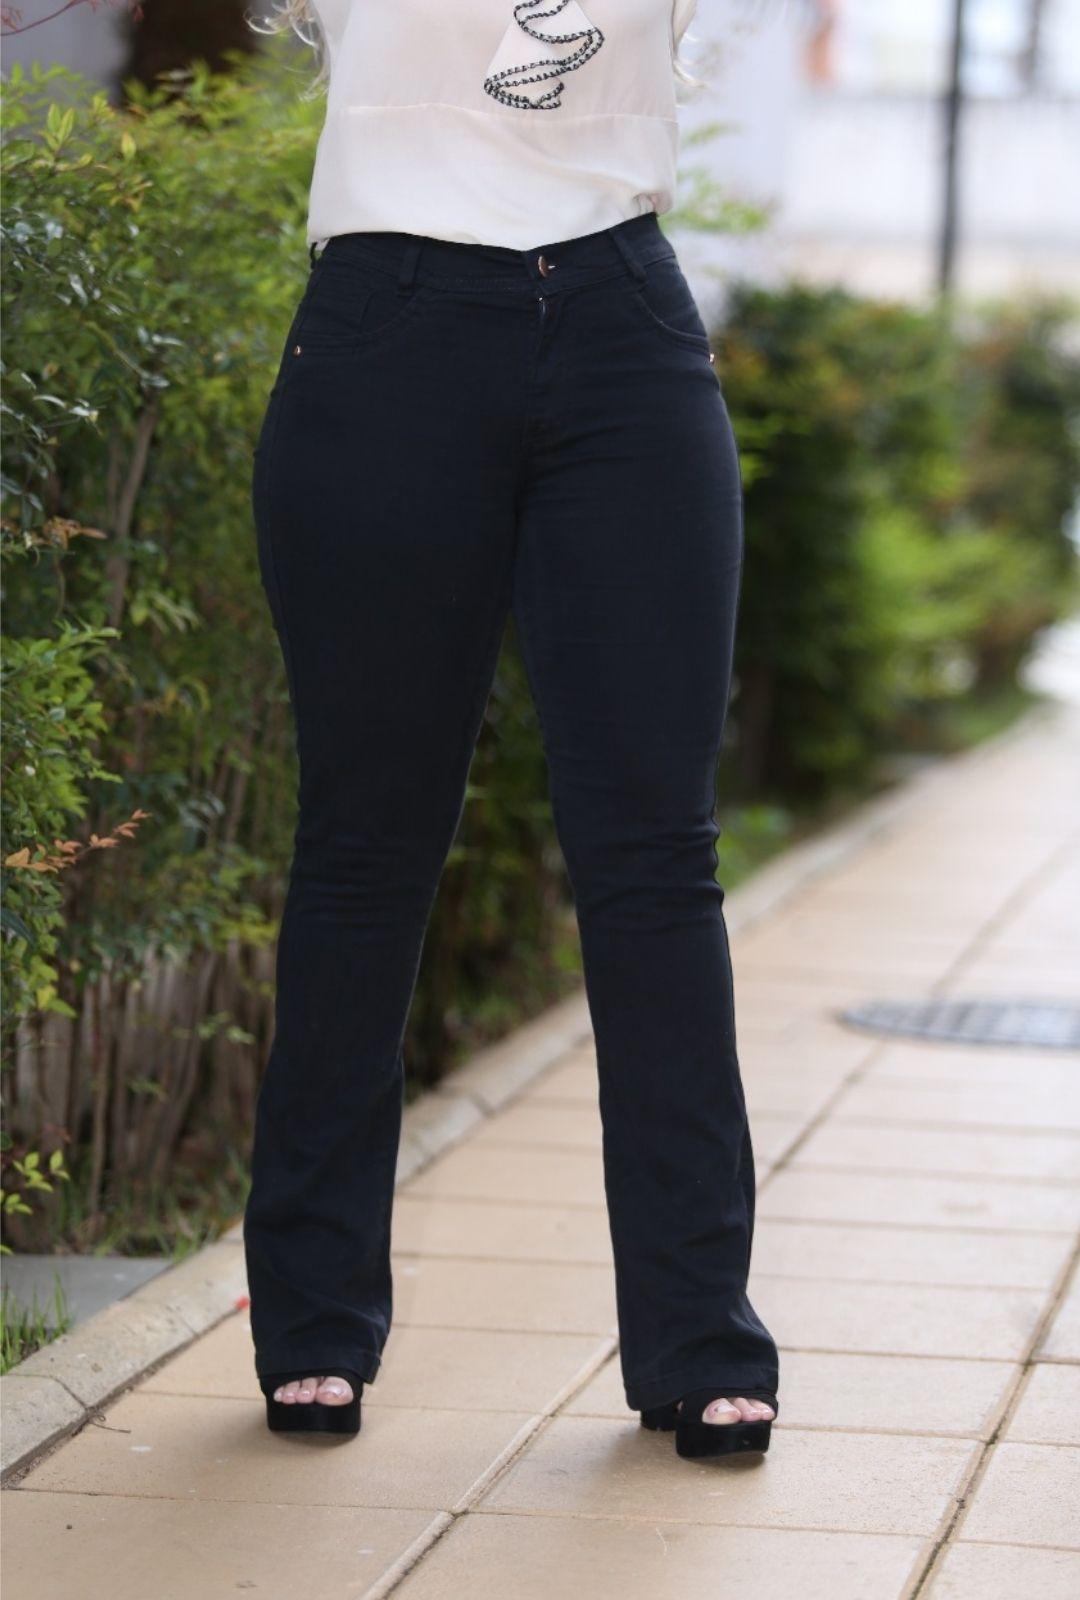 Calça Jeans Preta Flare  - ModaStore